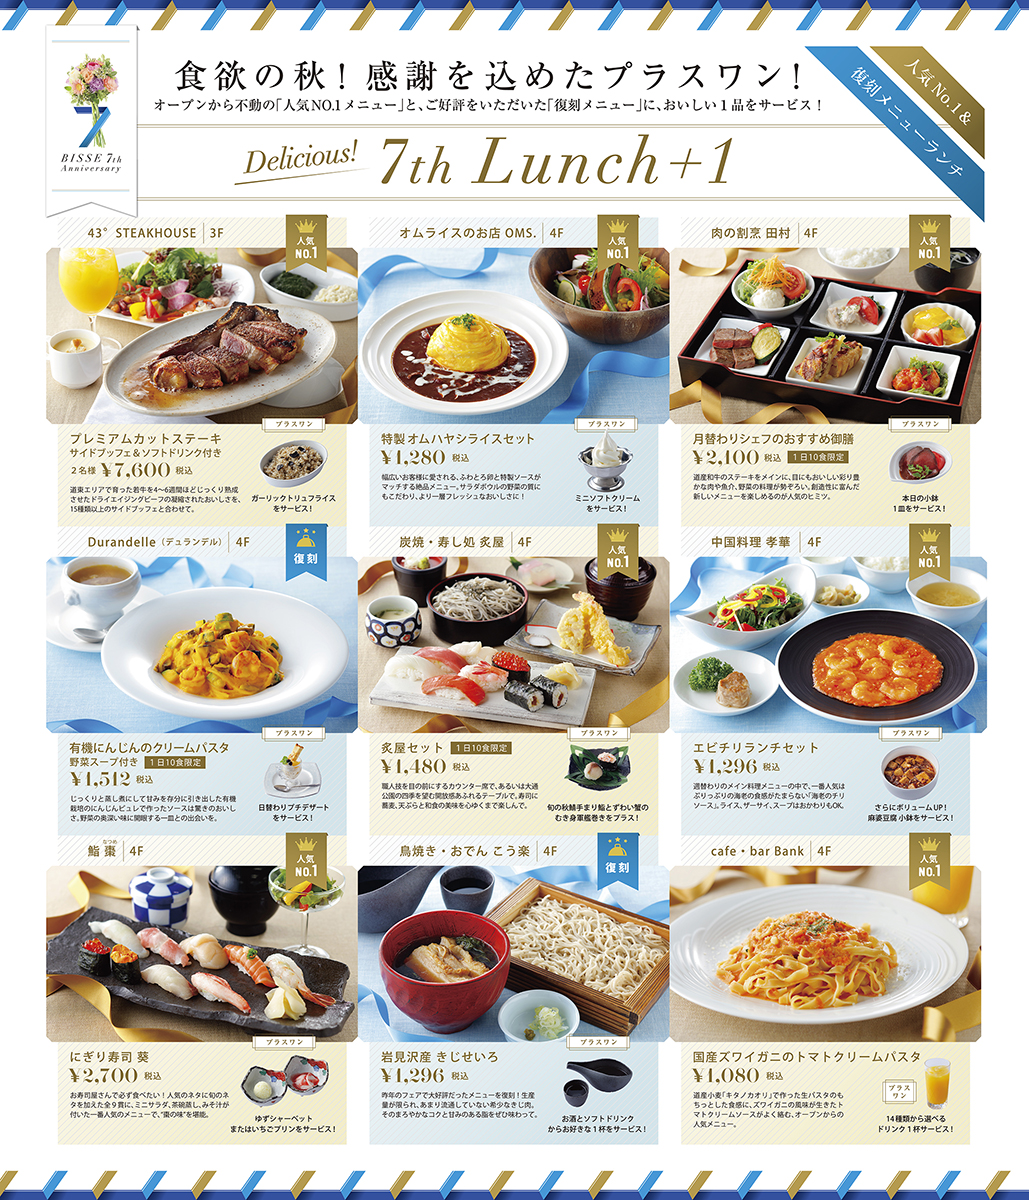 http://www.odori-bisse.com/info/up_images/news_170914_img01.jpg